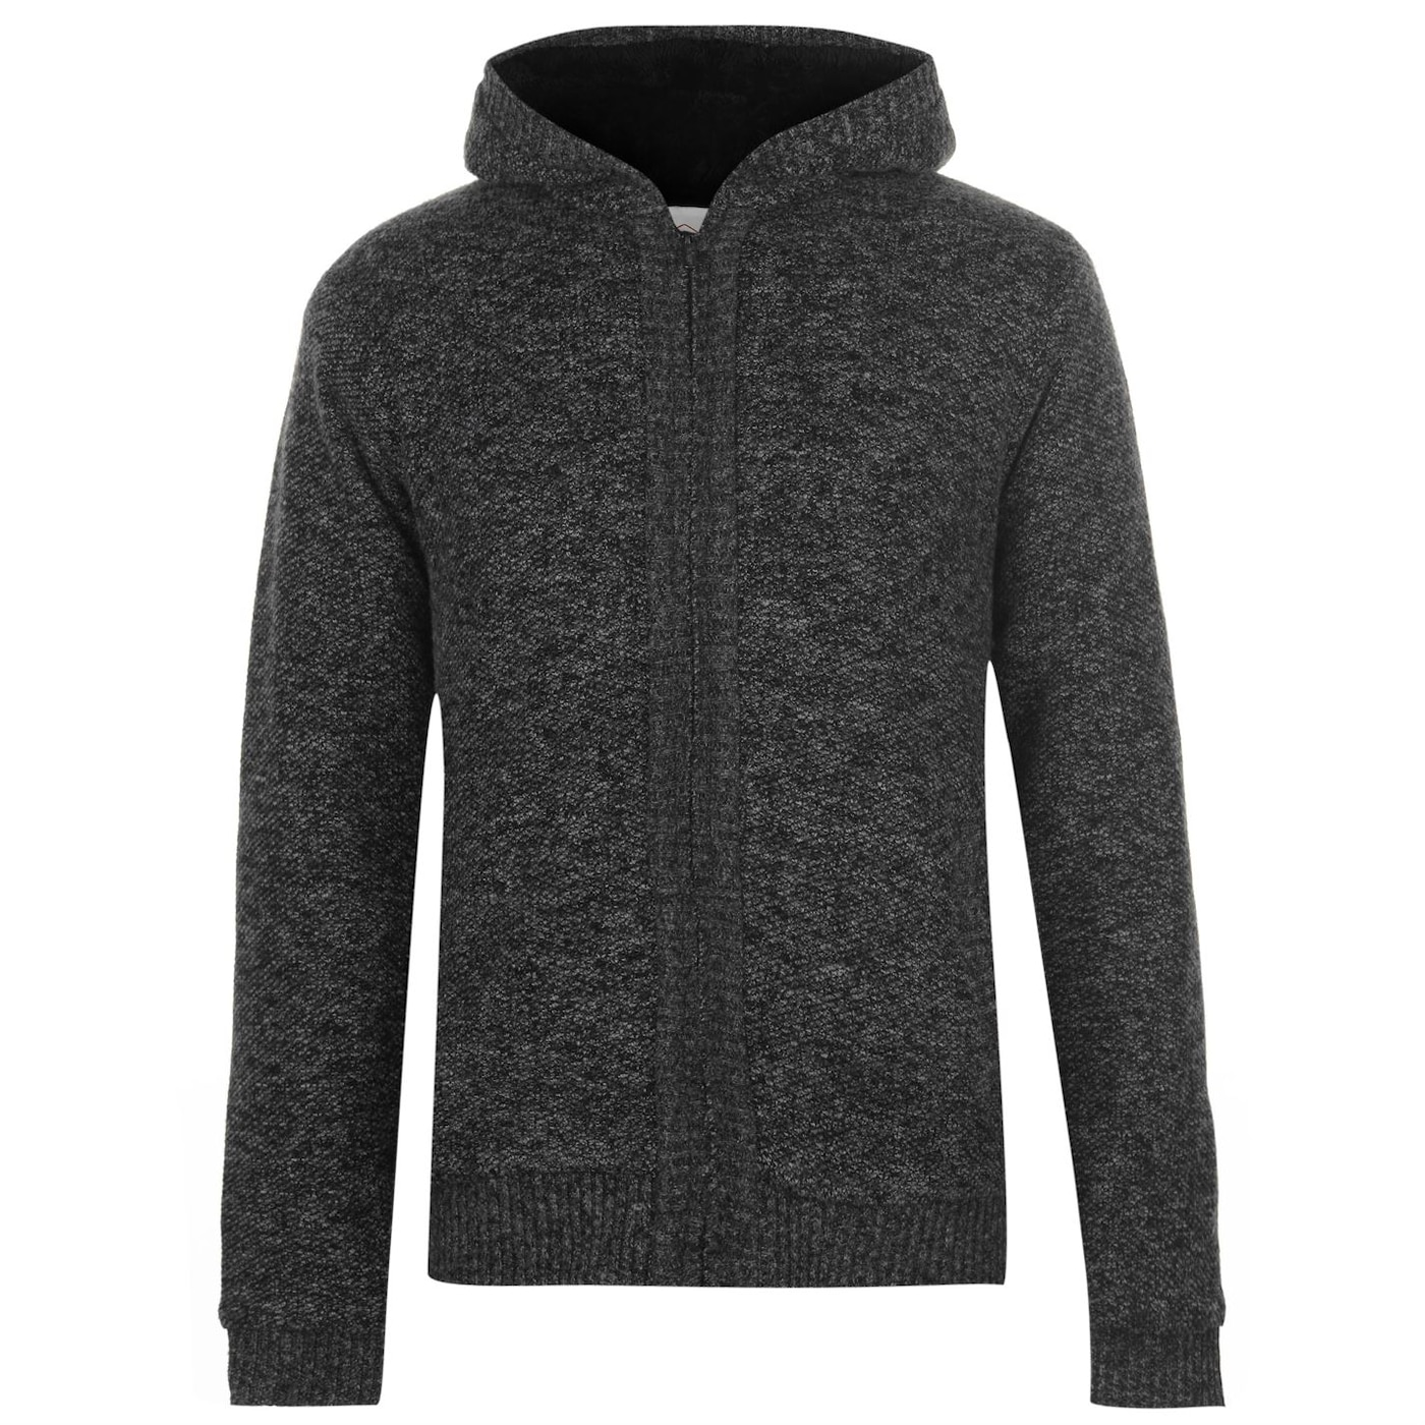 Lee Cooper Hooded Zip Knitted Jacket pánské